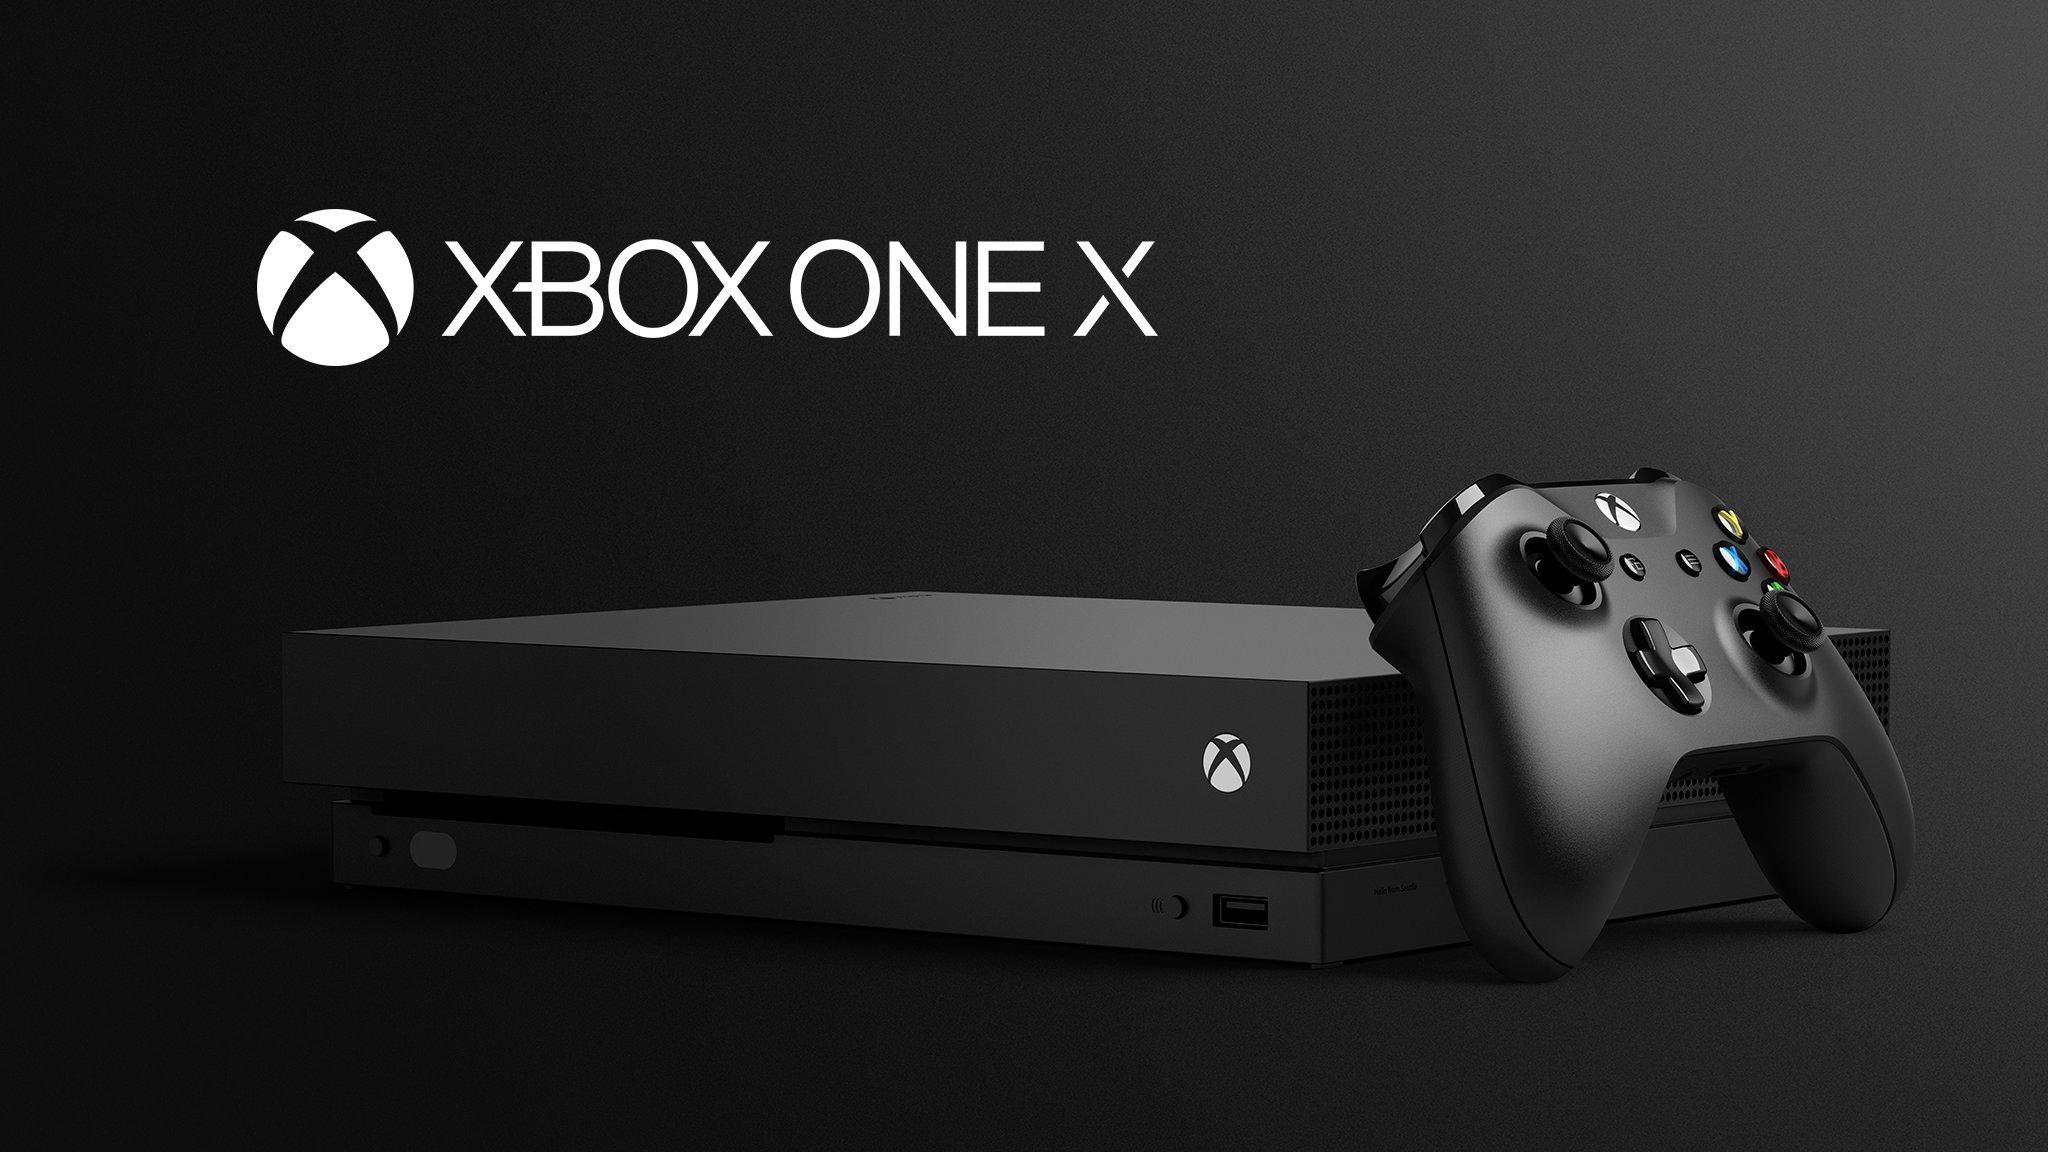 Gamescom 2017 | پیشخرید کنسول Xbox One X Project Scorpio Edition آغاز شد + تریلر معرفی